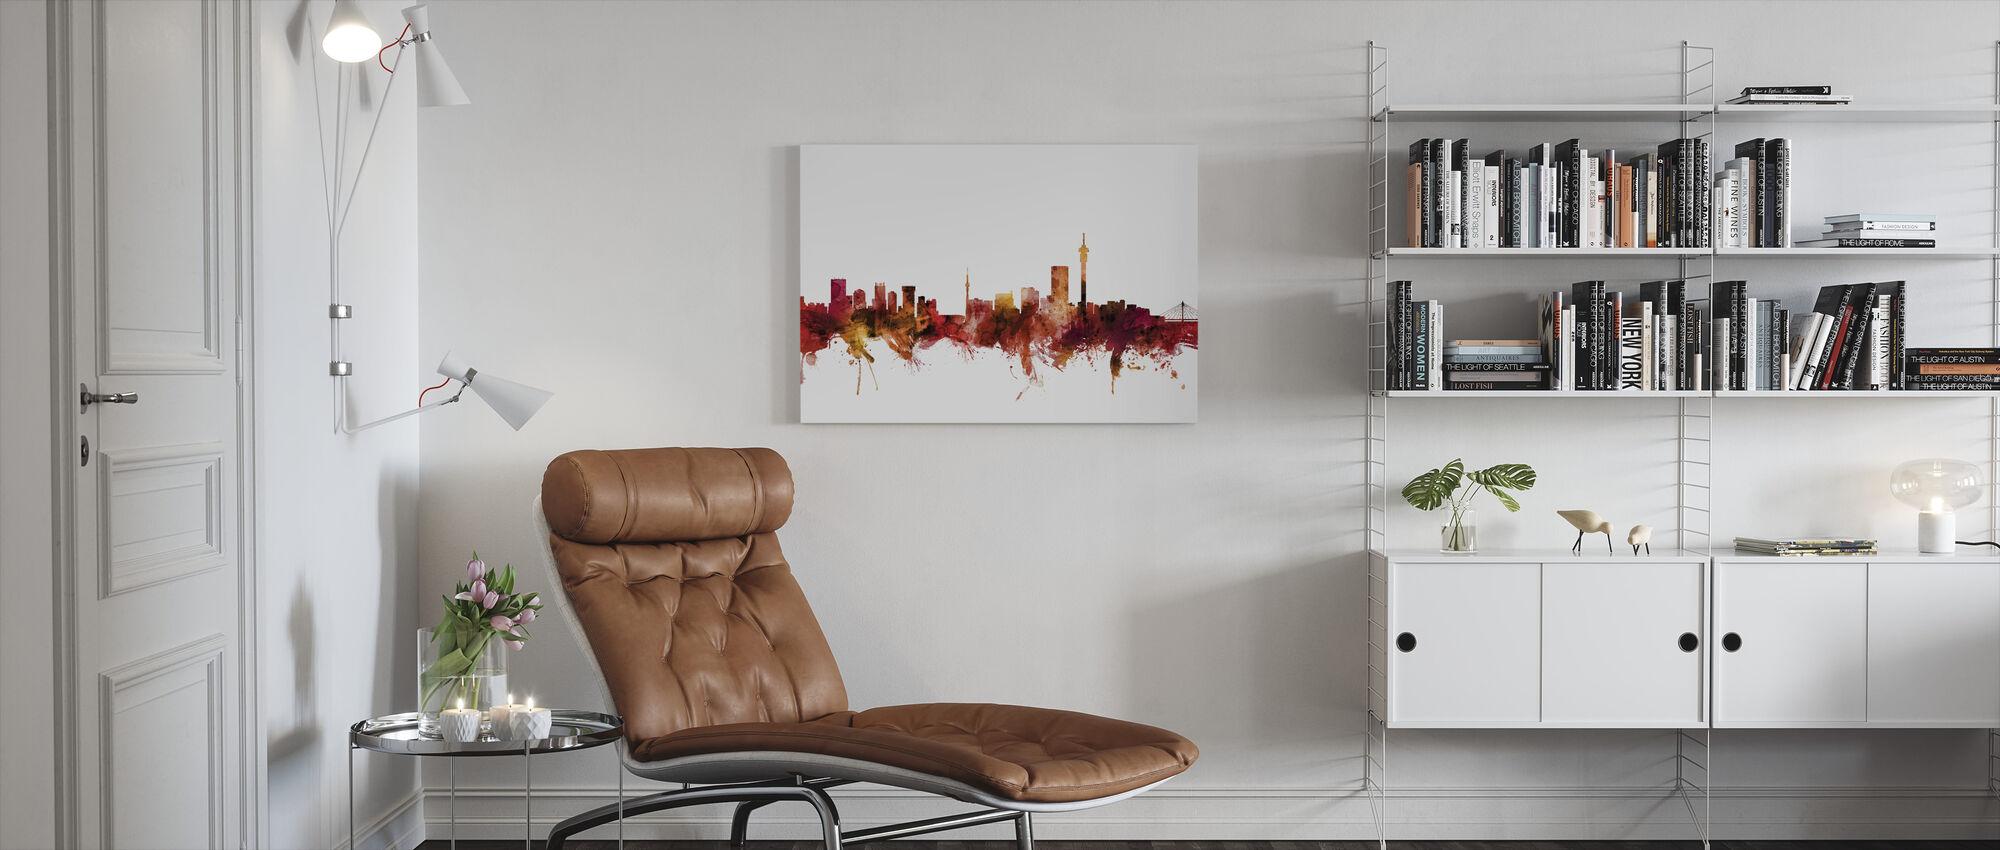 Johannesburg South Africa Skyline - Canvas print - Living Room